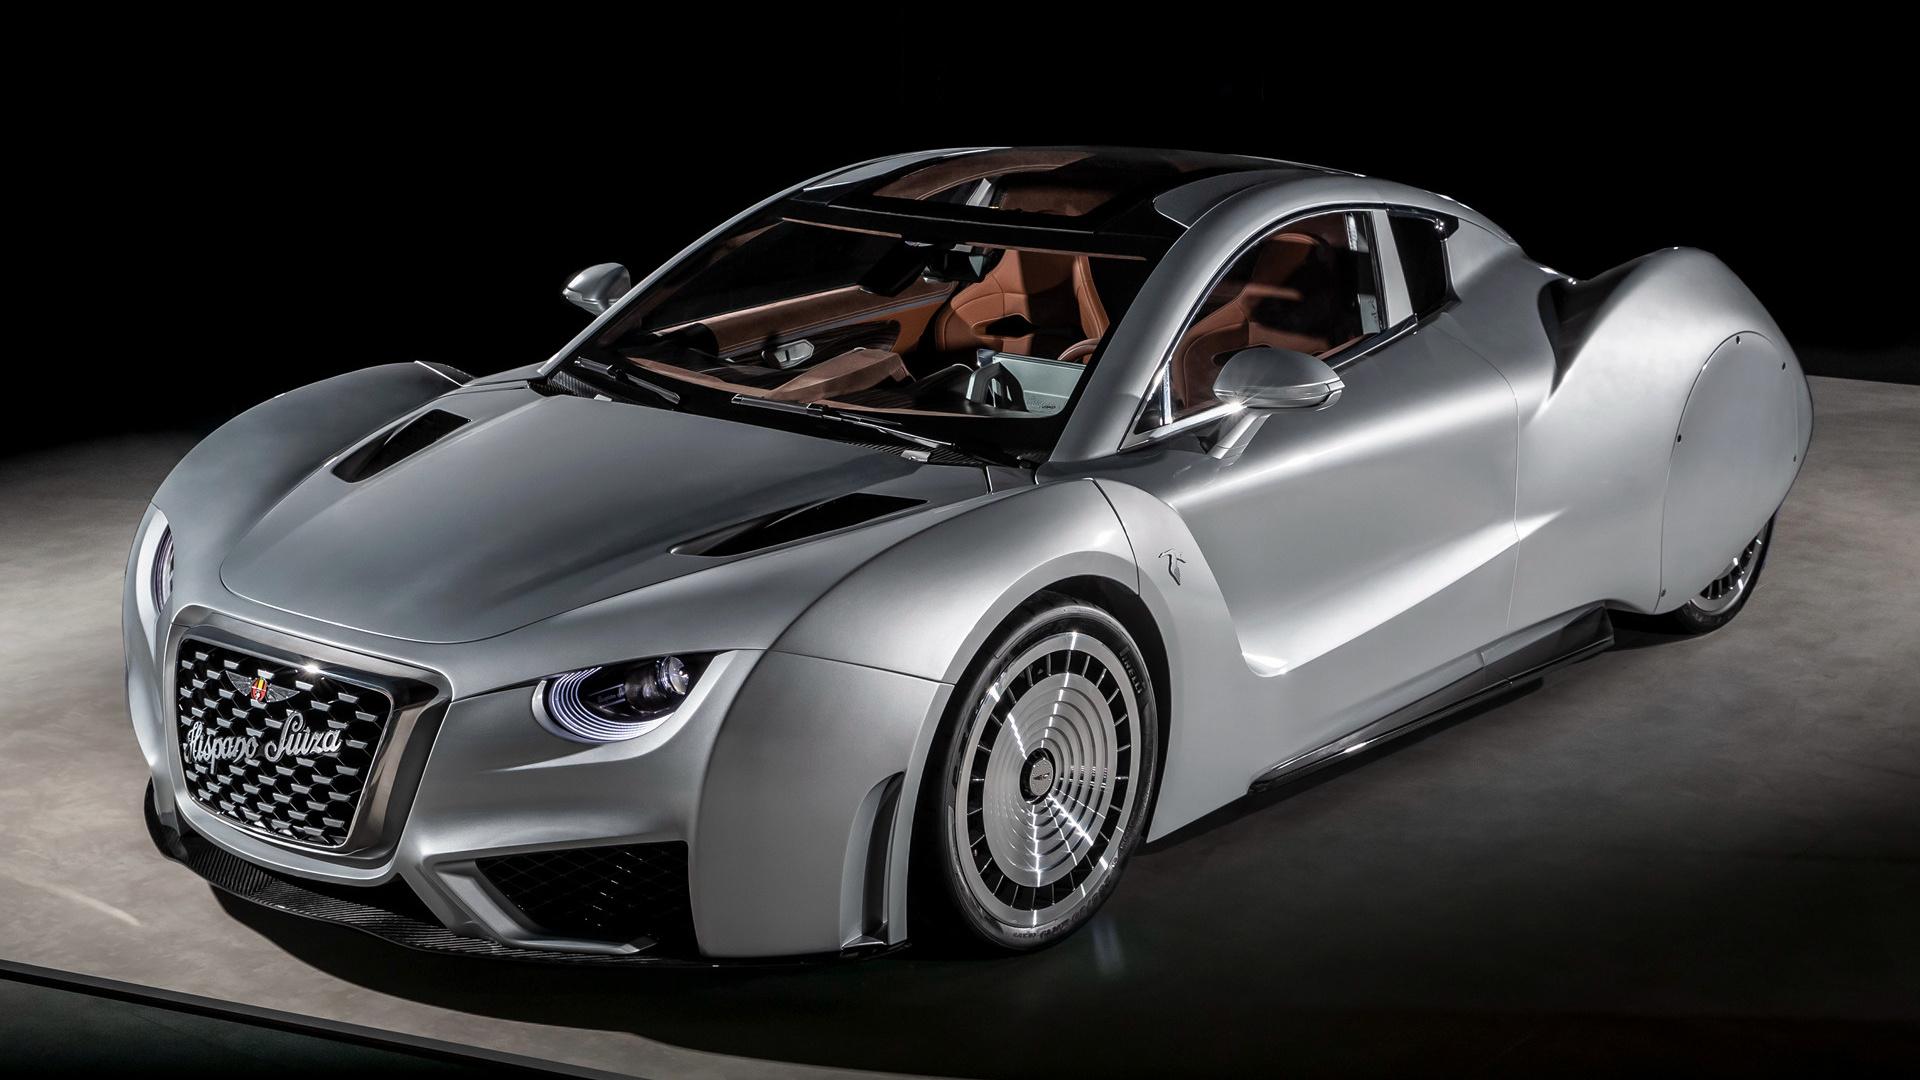 2019 hispano suiza carmen concept